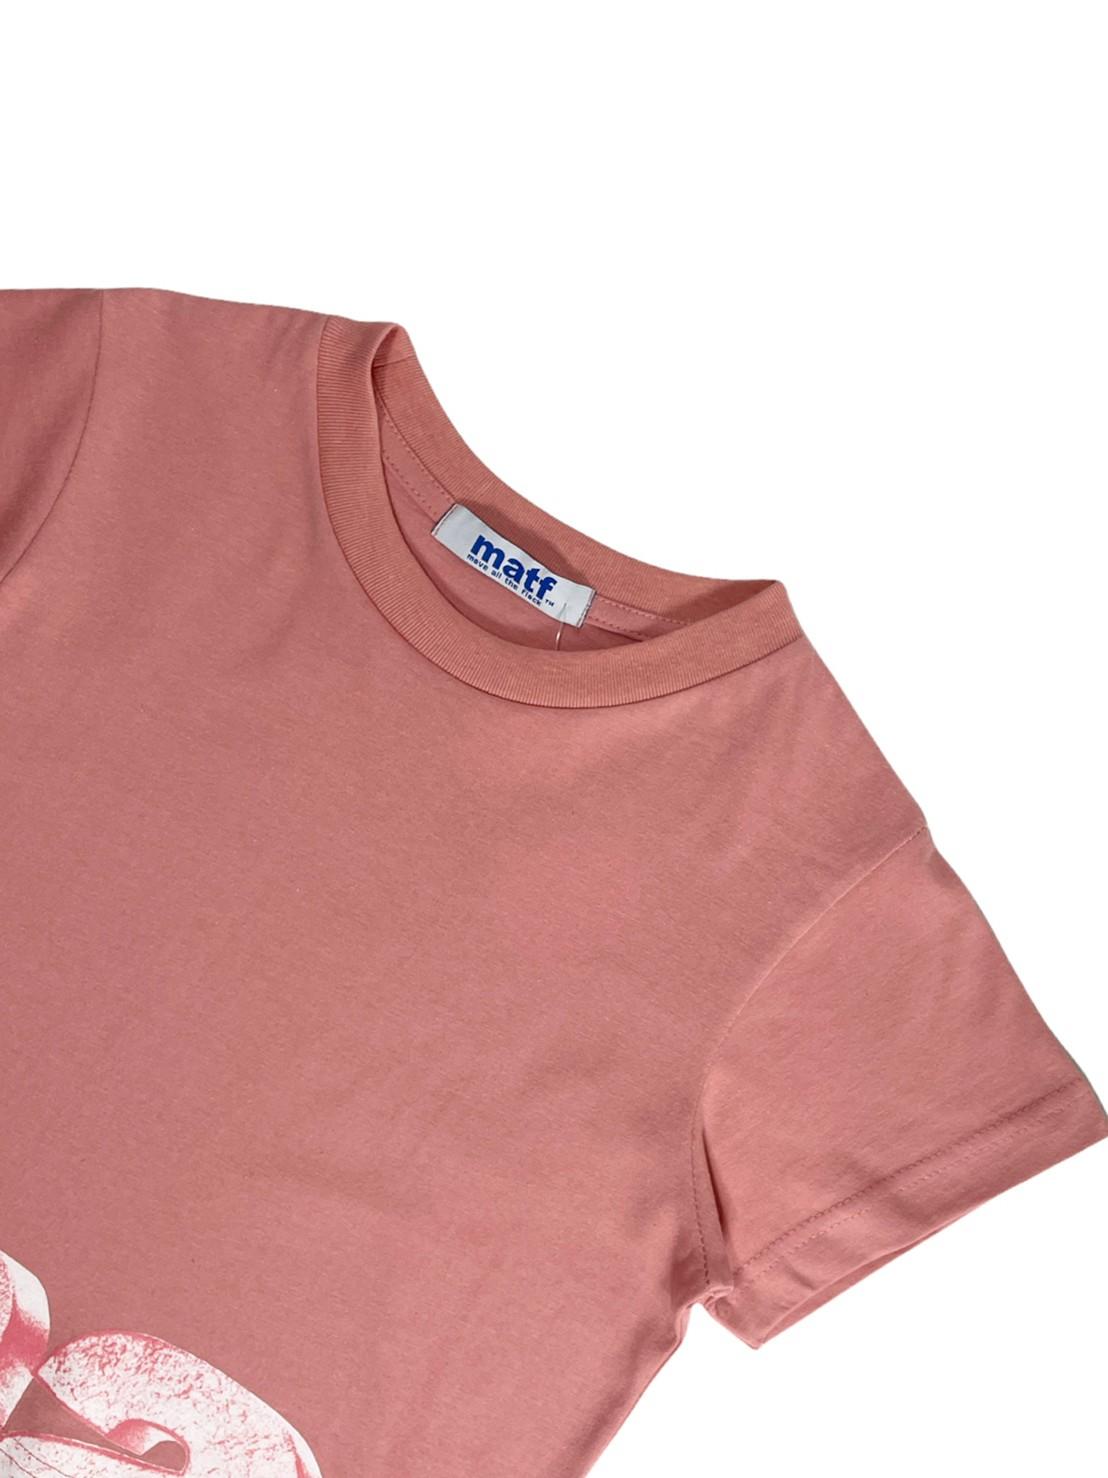 Matf *shift* crop top t-shirt (rose pink)